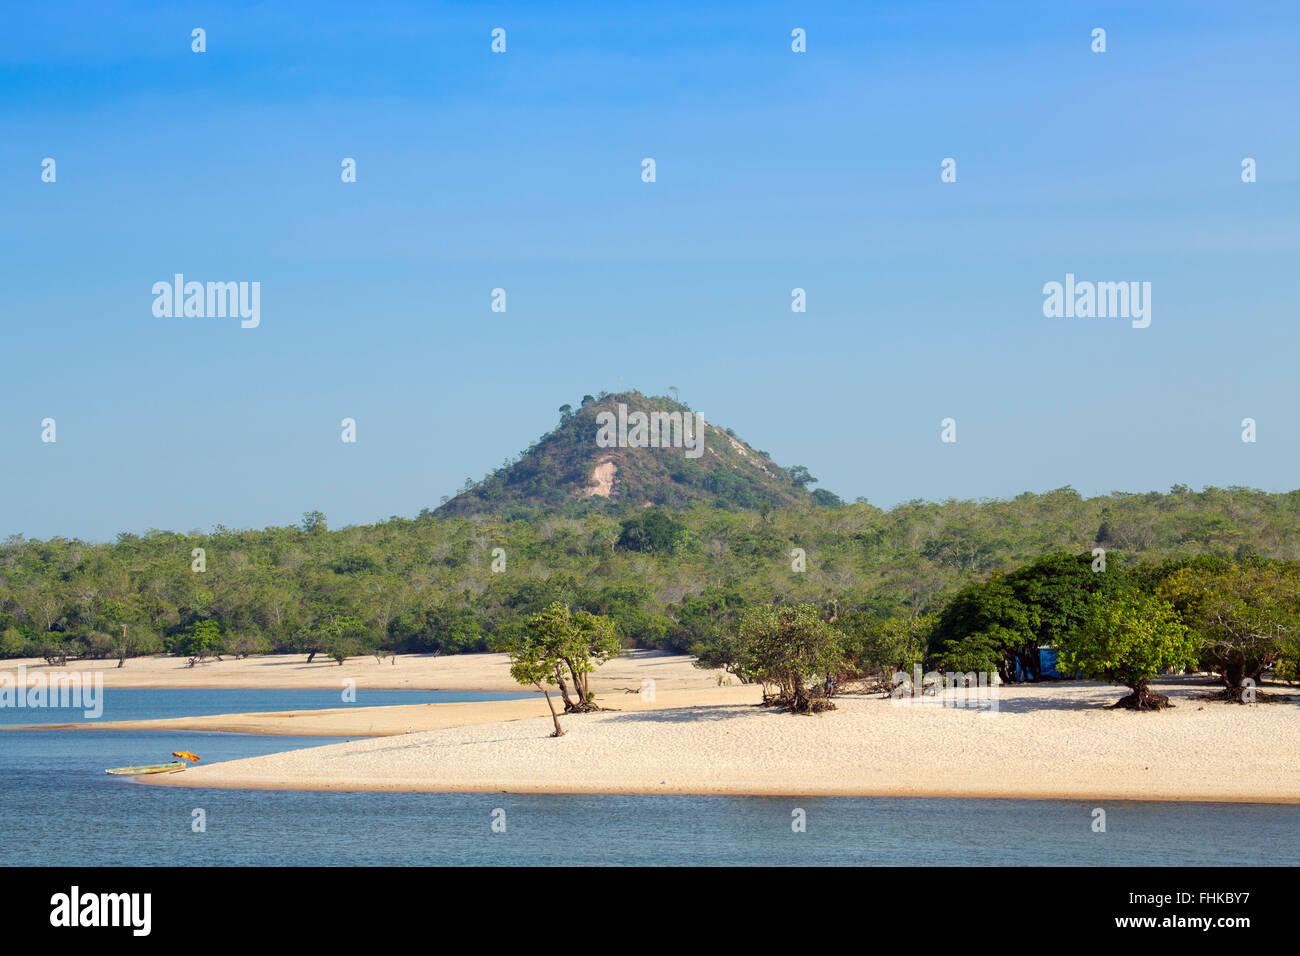 Ilha do Amor (love island) and beach in Alter do Chao, Brazilian Amazon - Stock Image